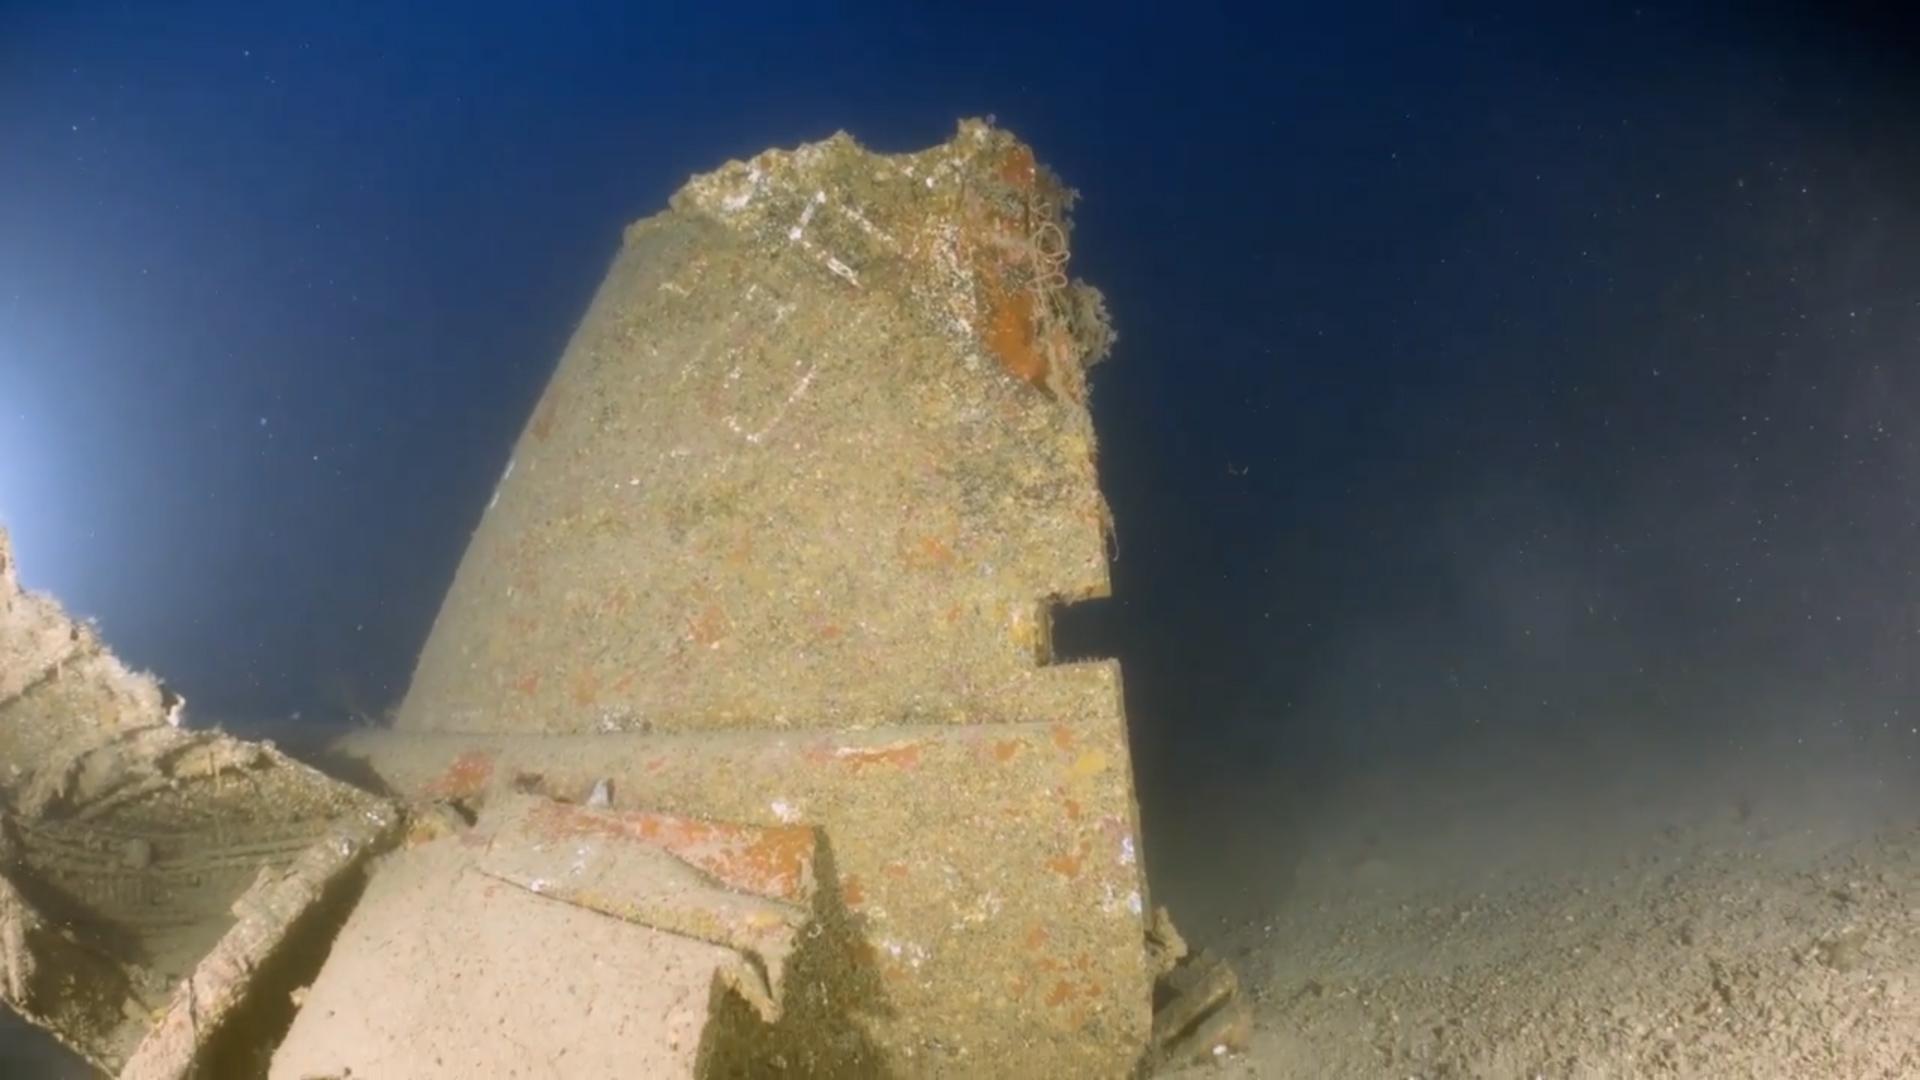 Ju 88 tail damage [Heritage Malta]